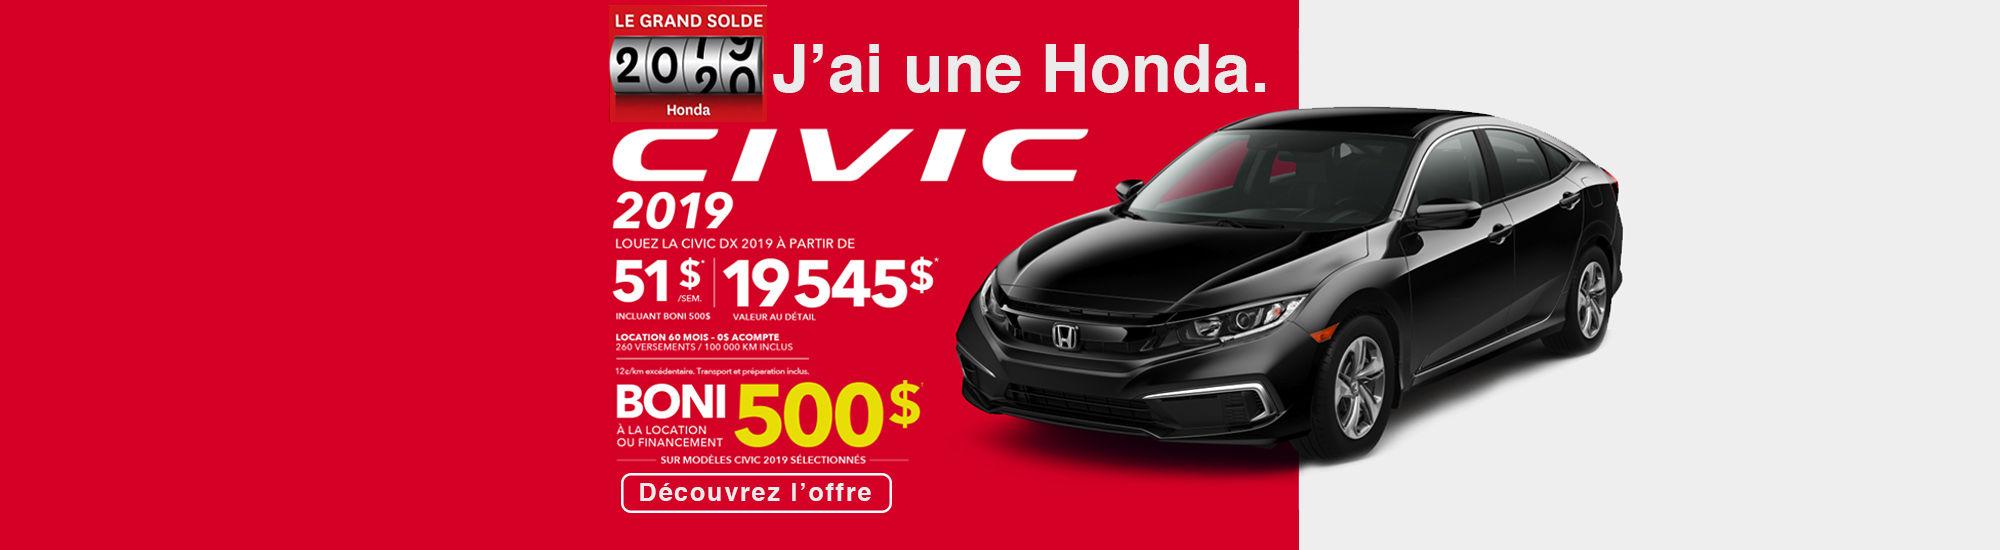 Honda le grand solde